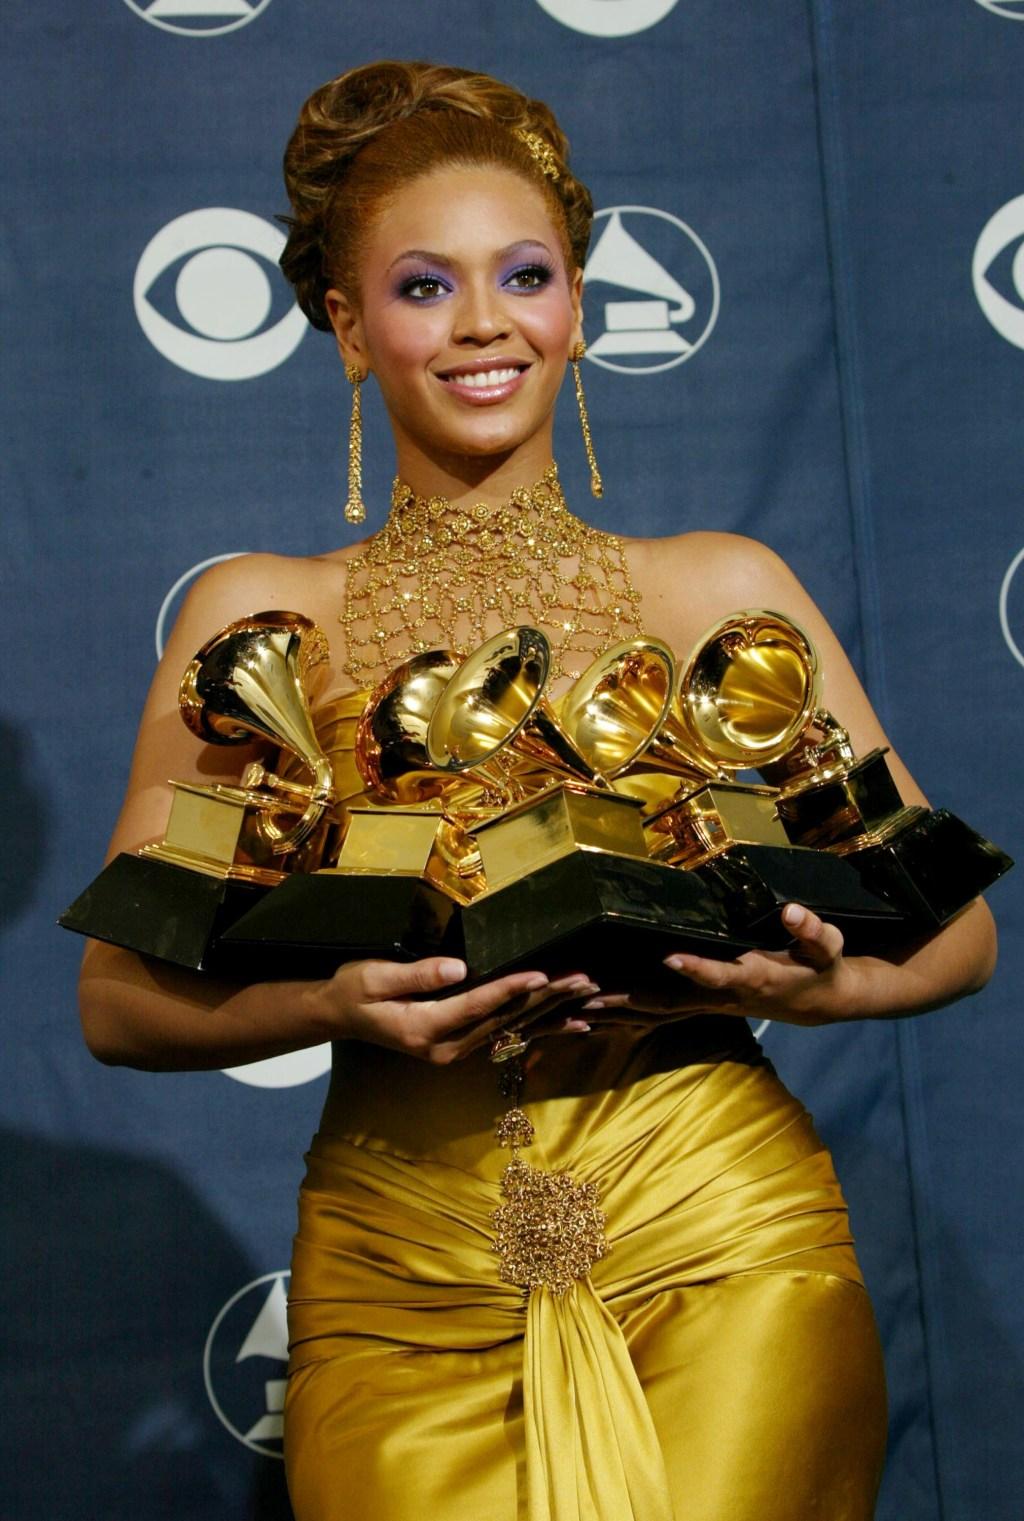 46th Annual Grammy Awards - Pressroom